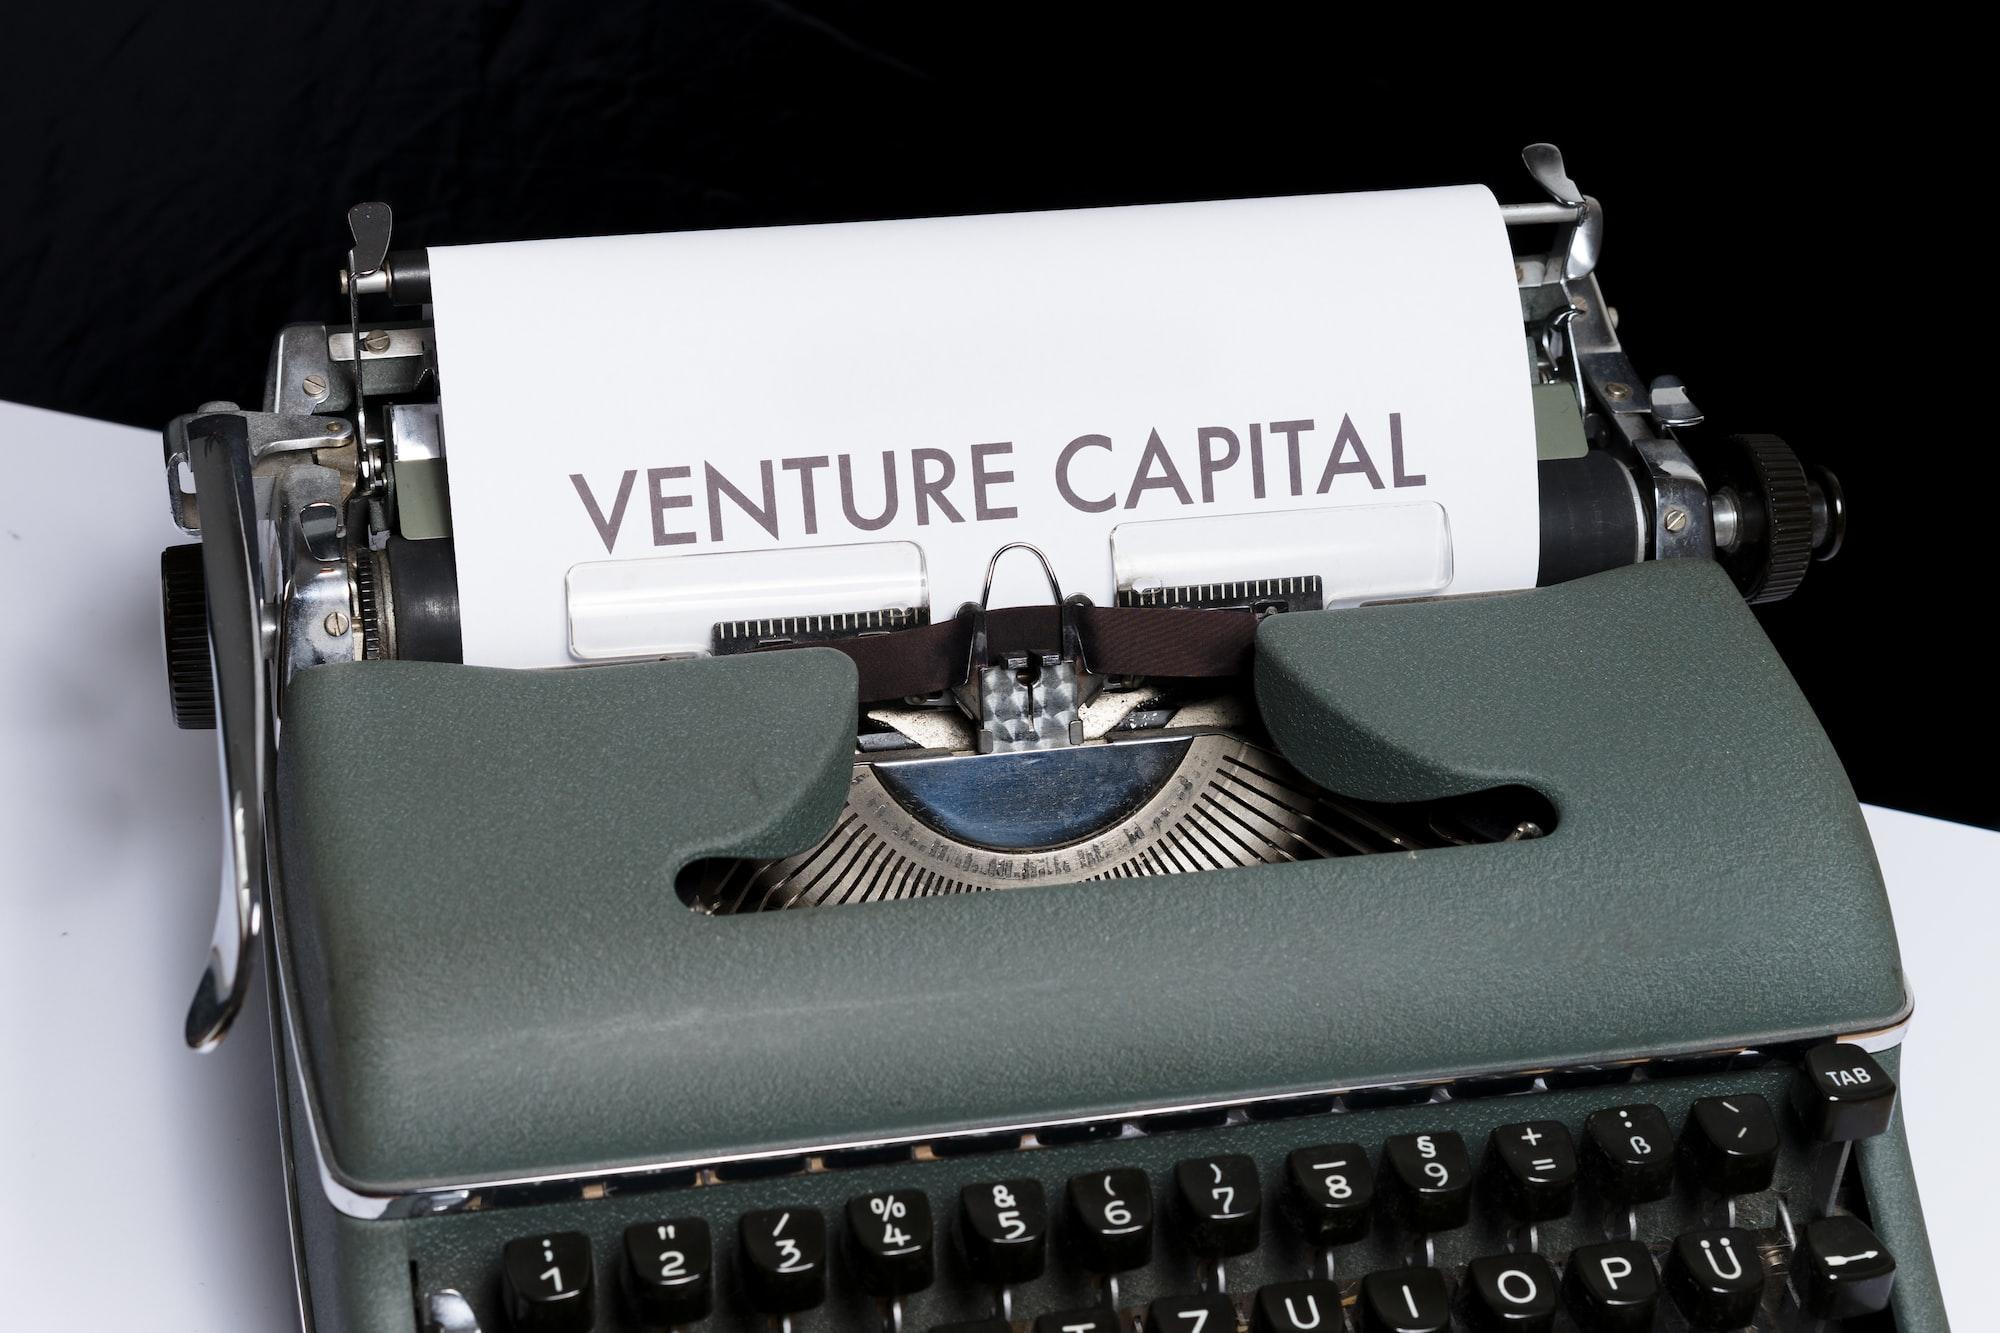 Hong Kong 2021 Venture Capital World Summit